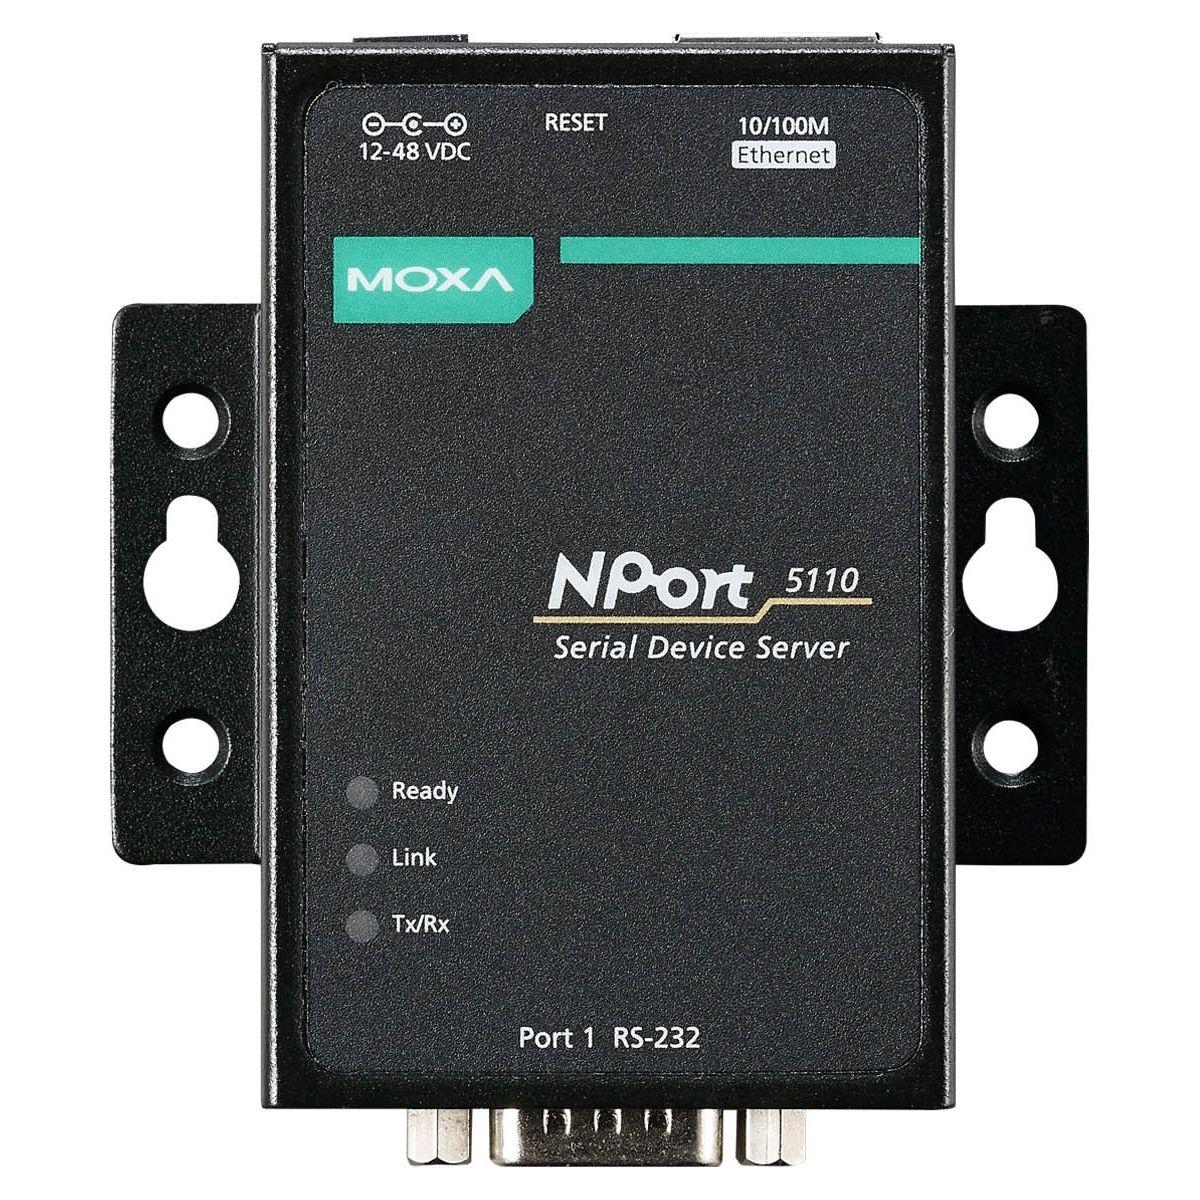 NPort 5110